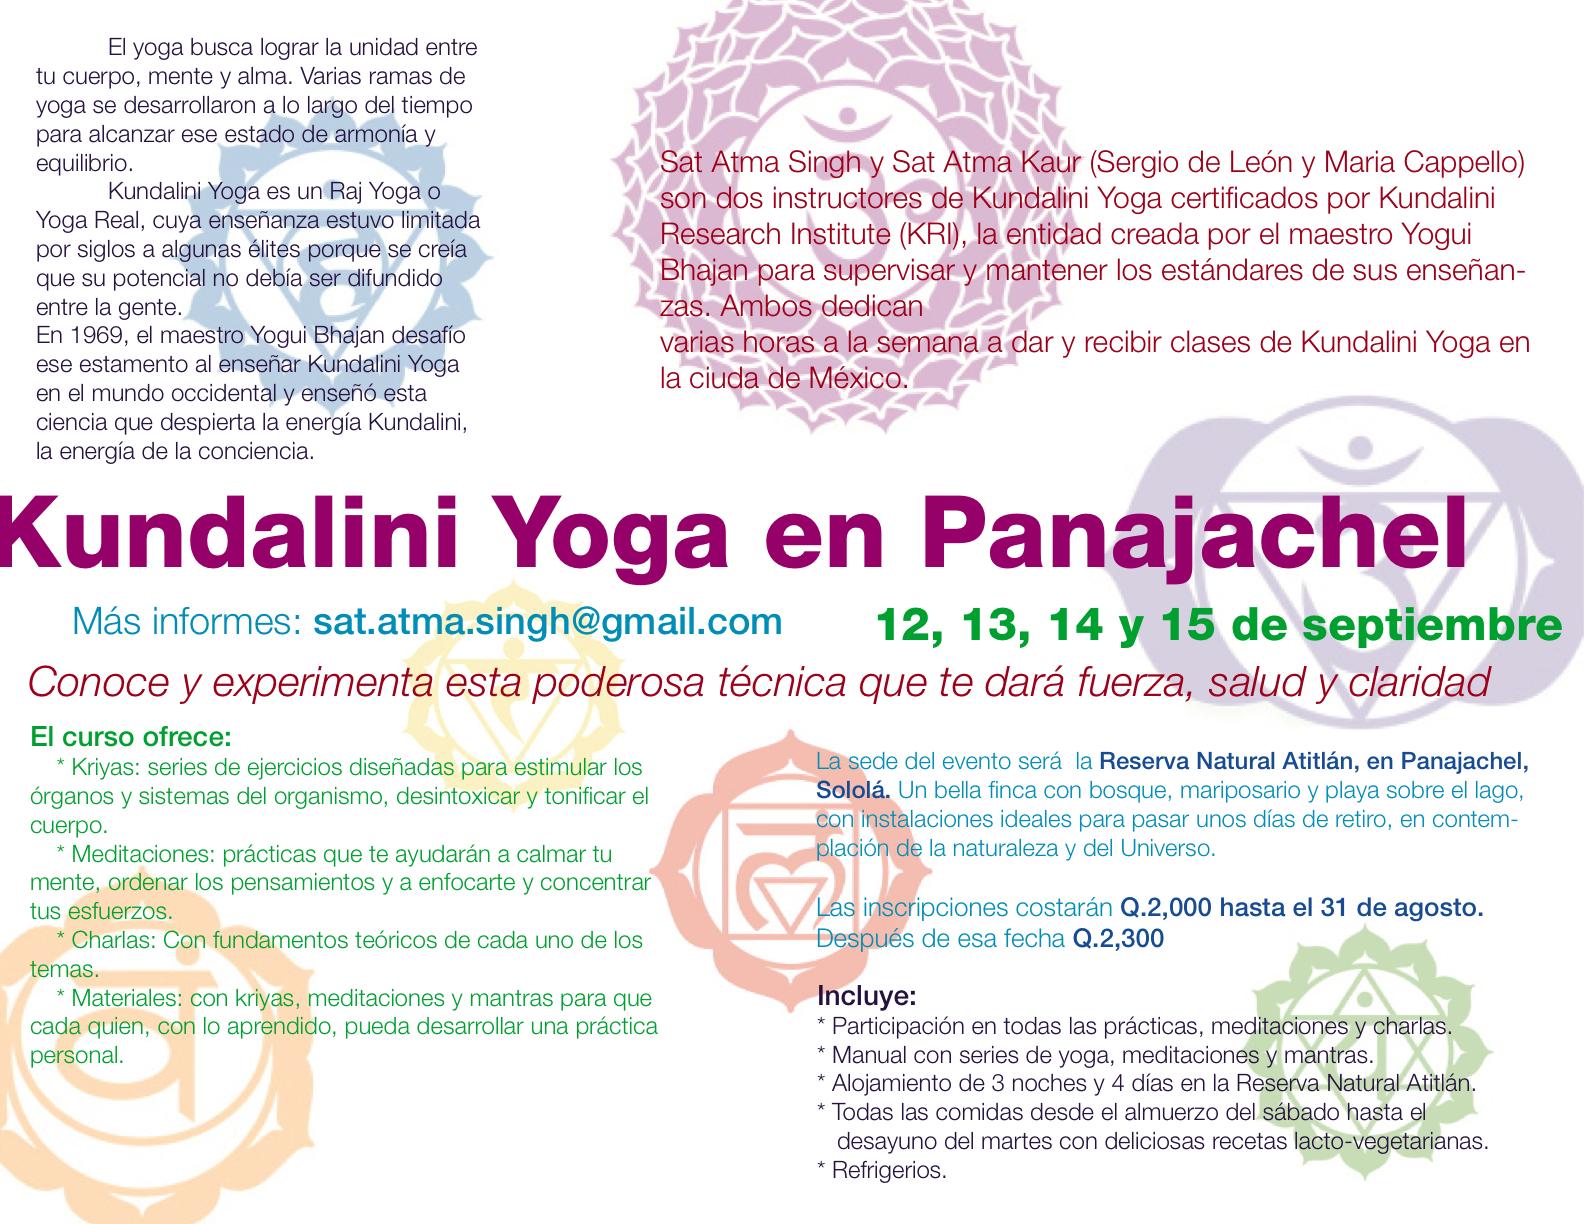 Newest Kundalini Yoga Poster | Davagy de León